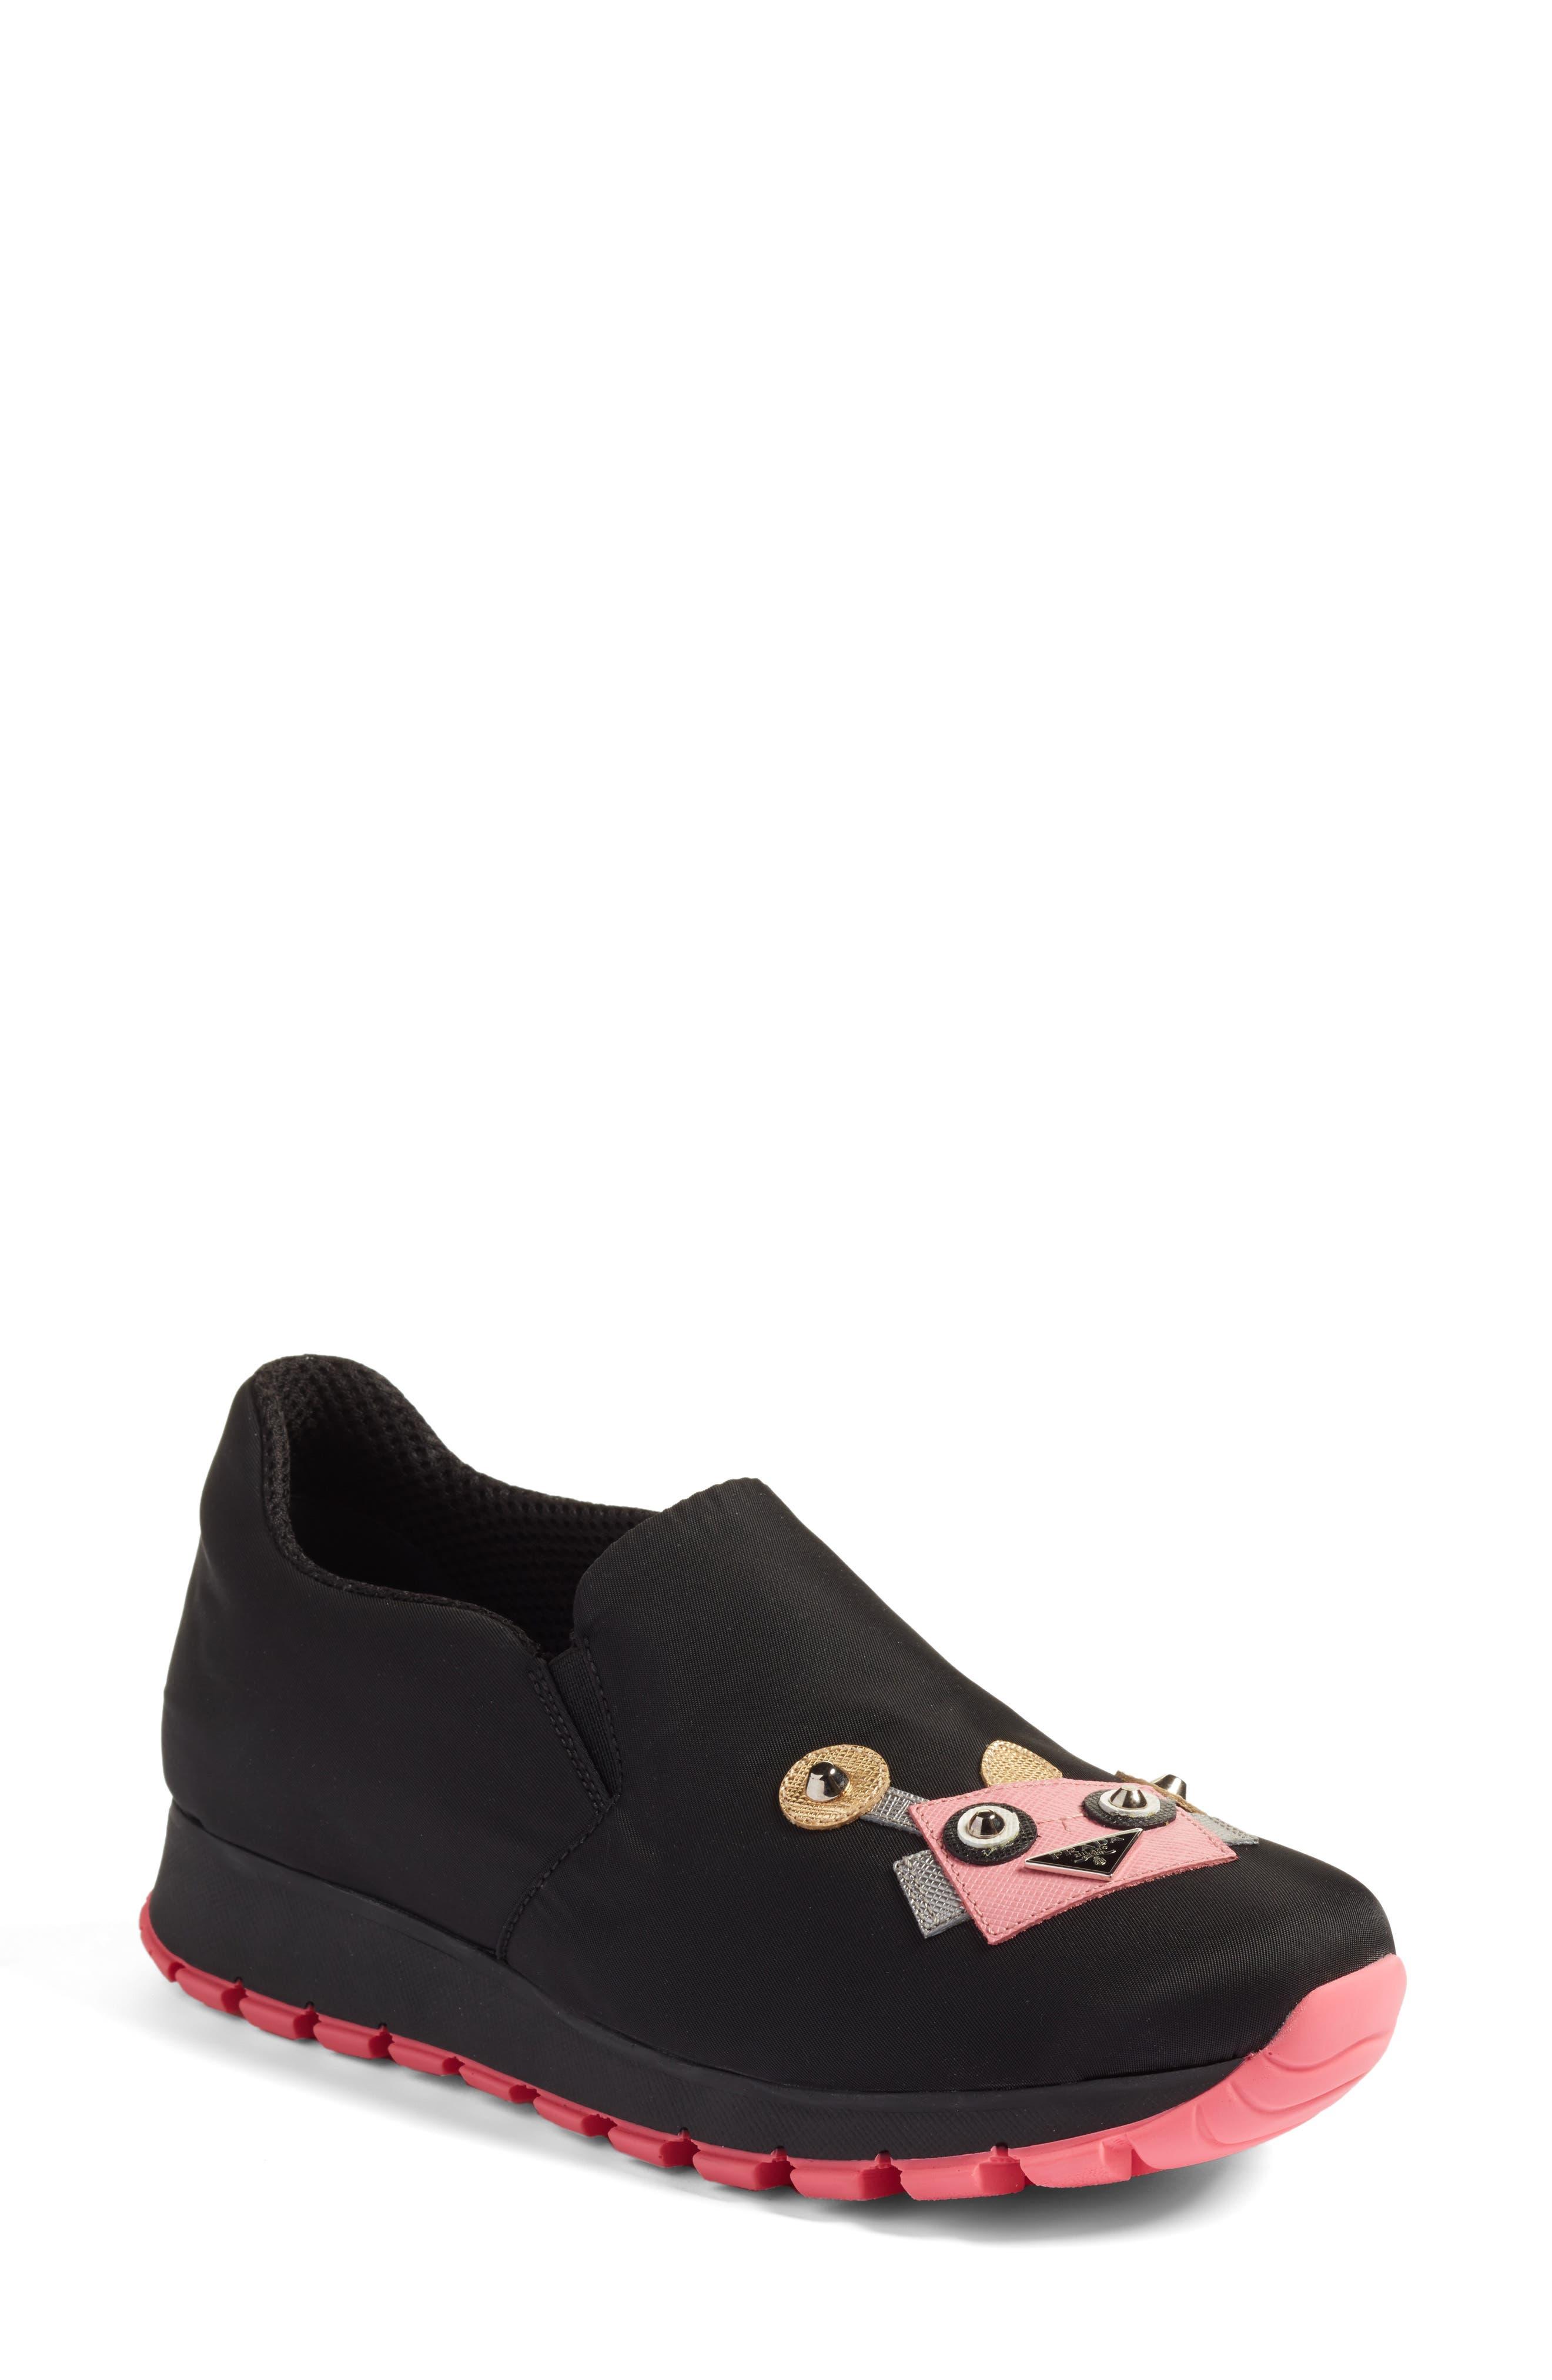 Main Image - Prada Robot Slip-On Sneaker (Women)